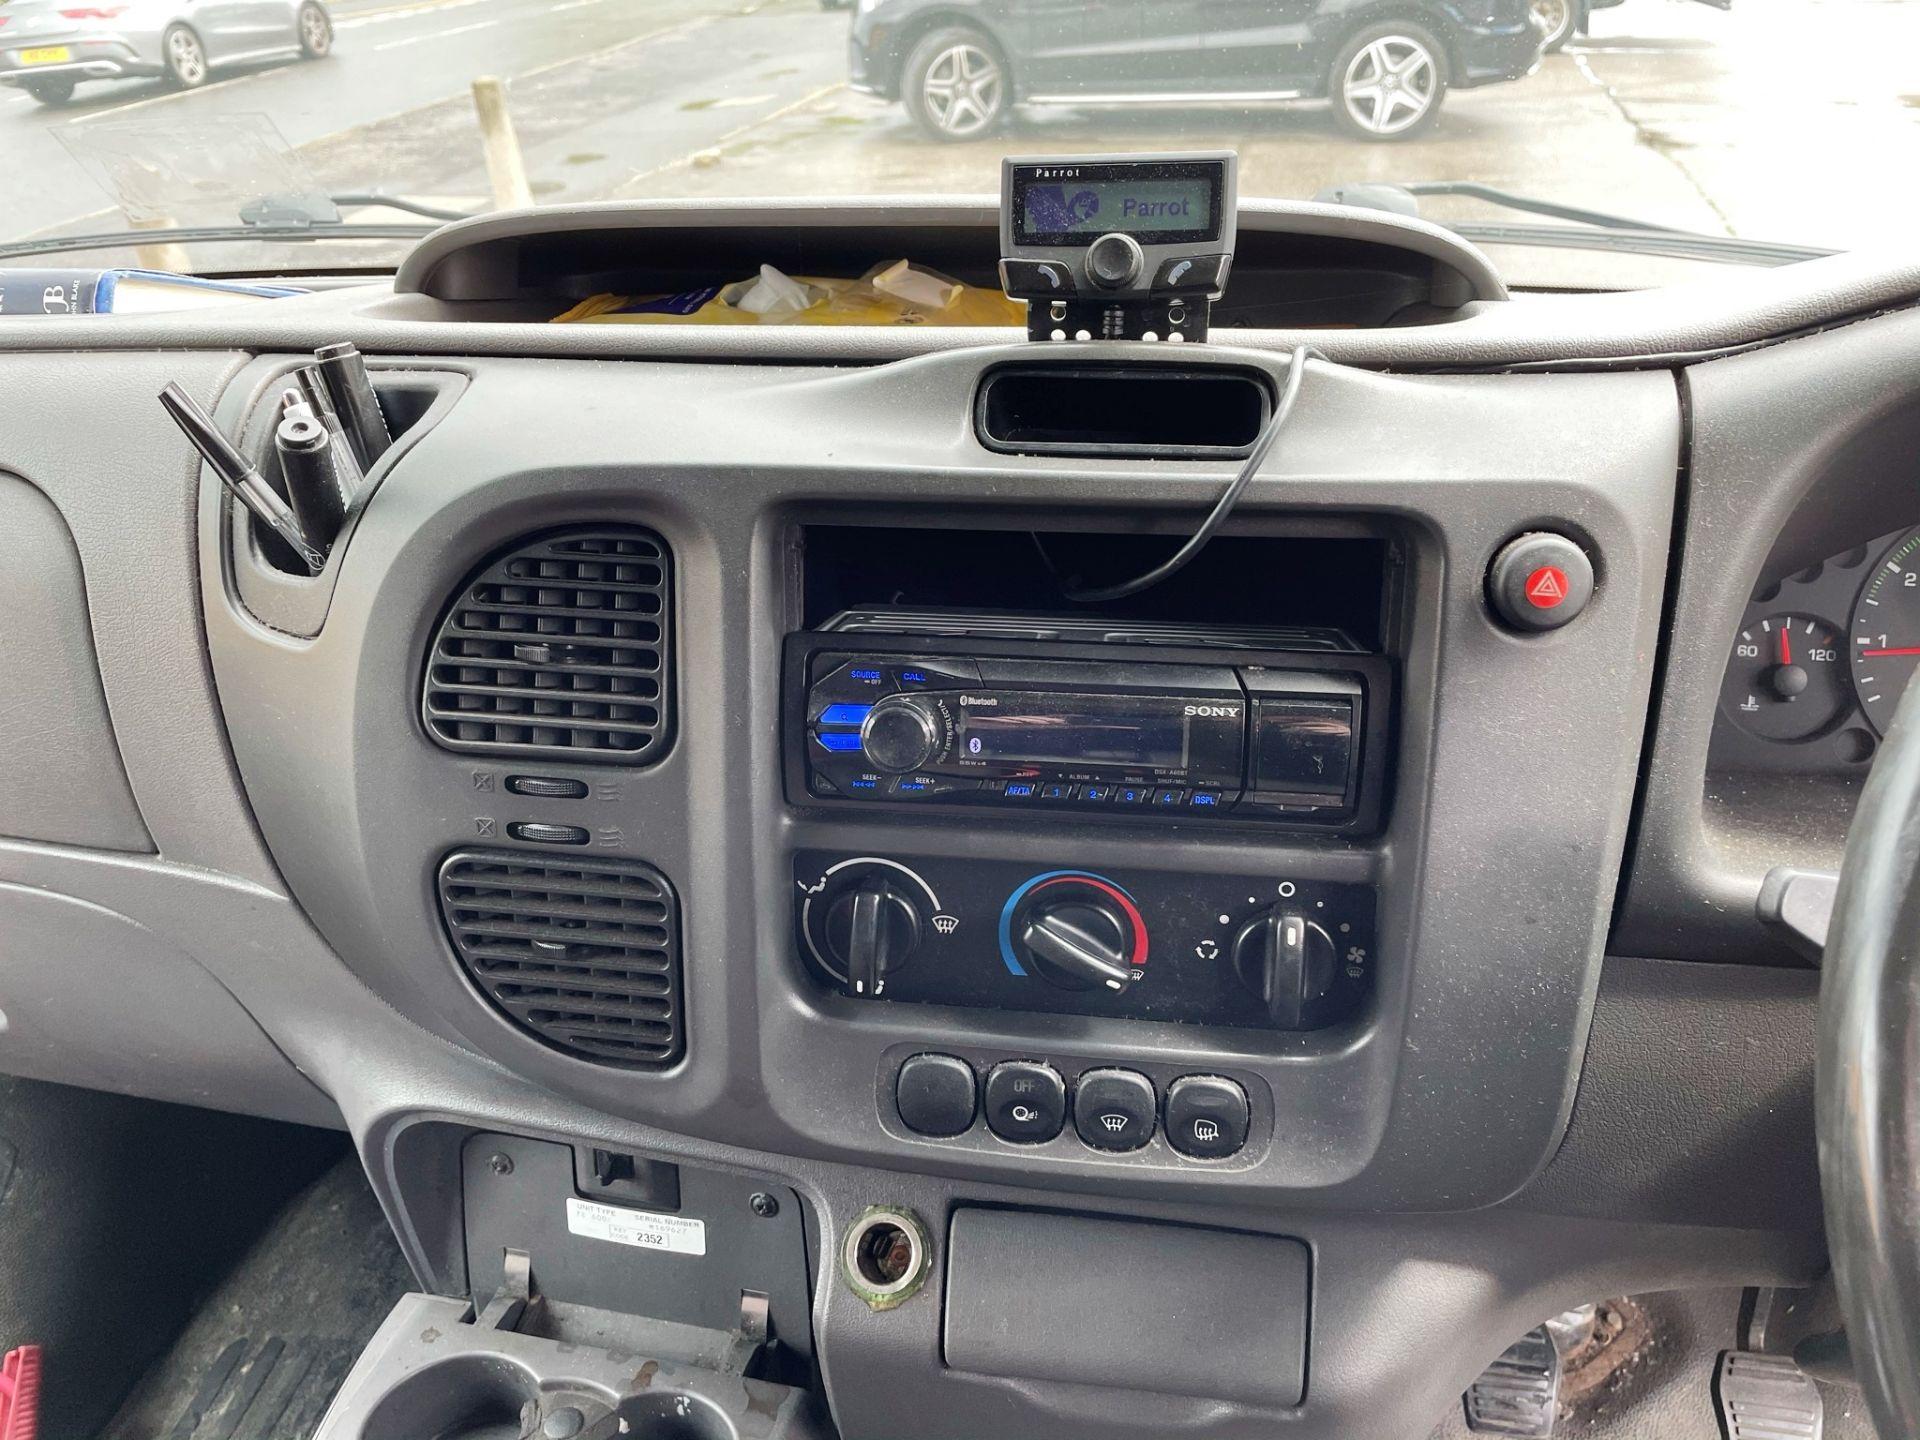 Ford Transit 350 LWB Panel Van   05 Plate  168,443 Miles - Image 20 of 22